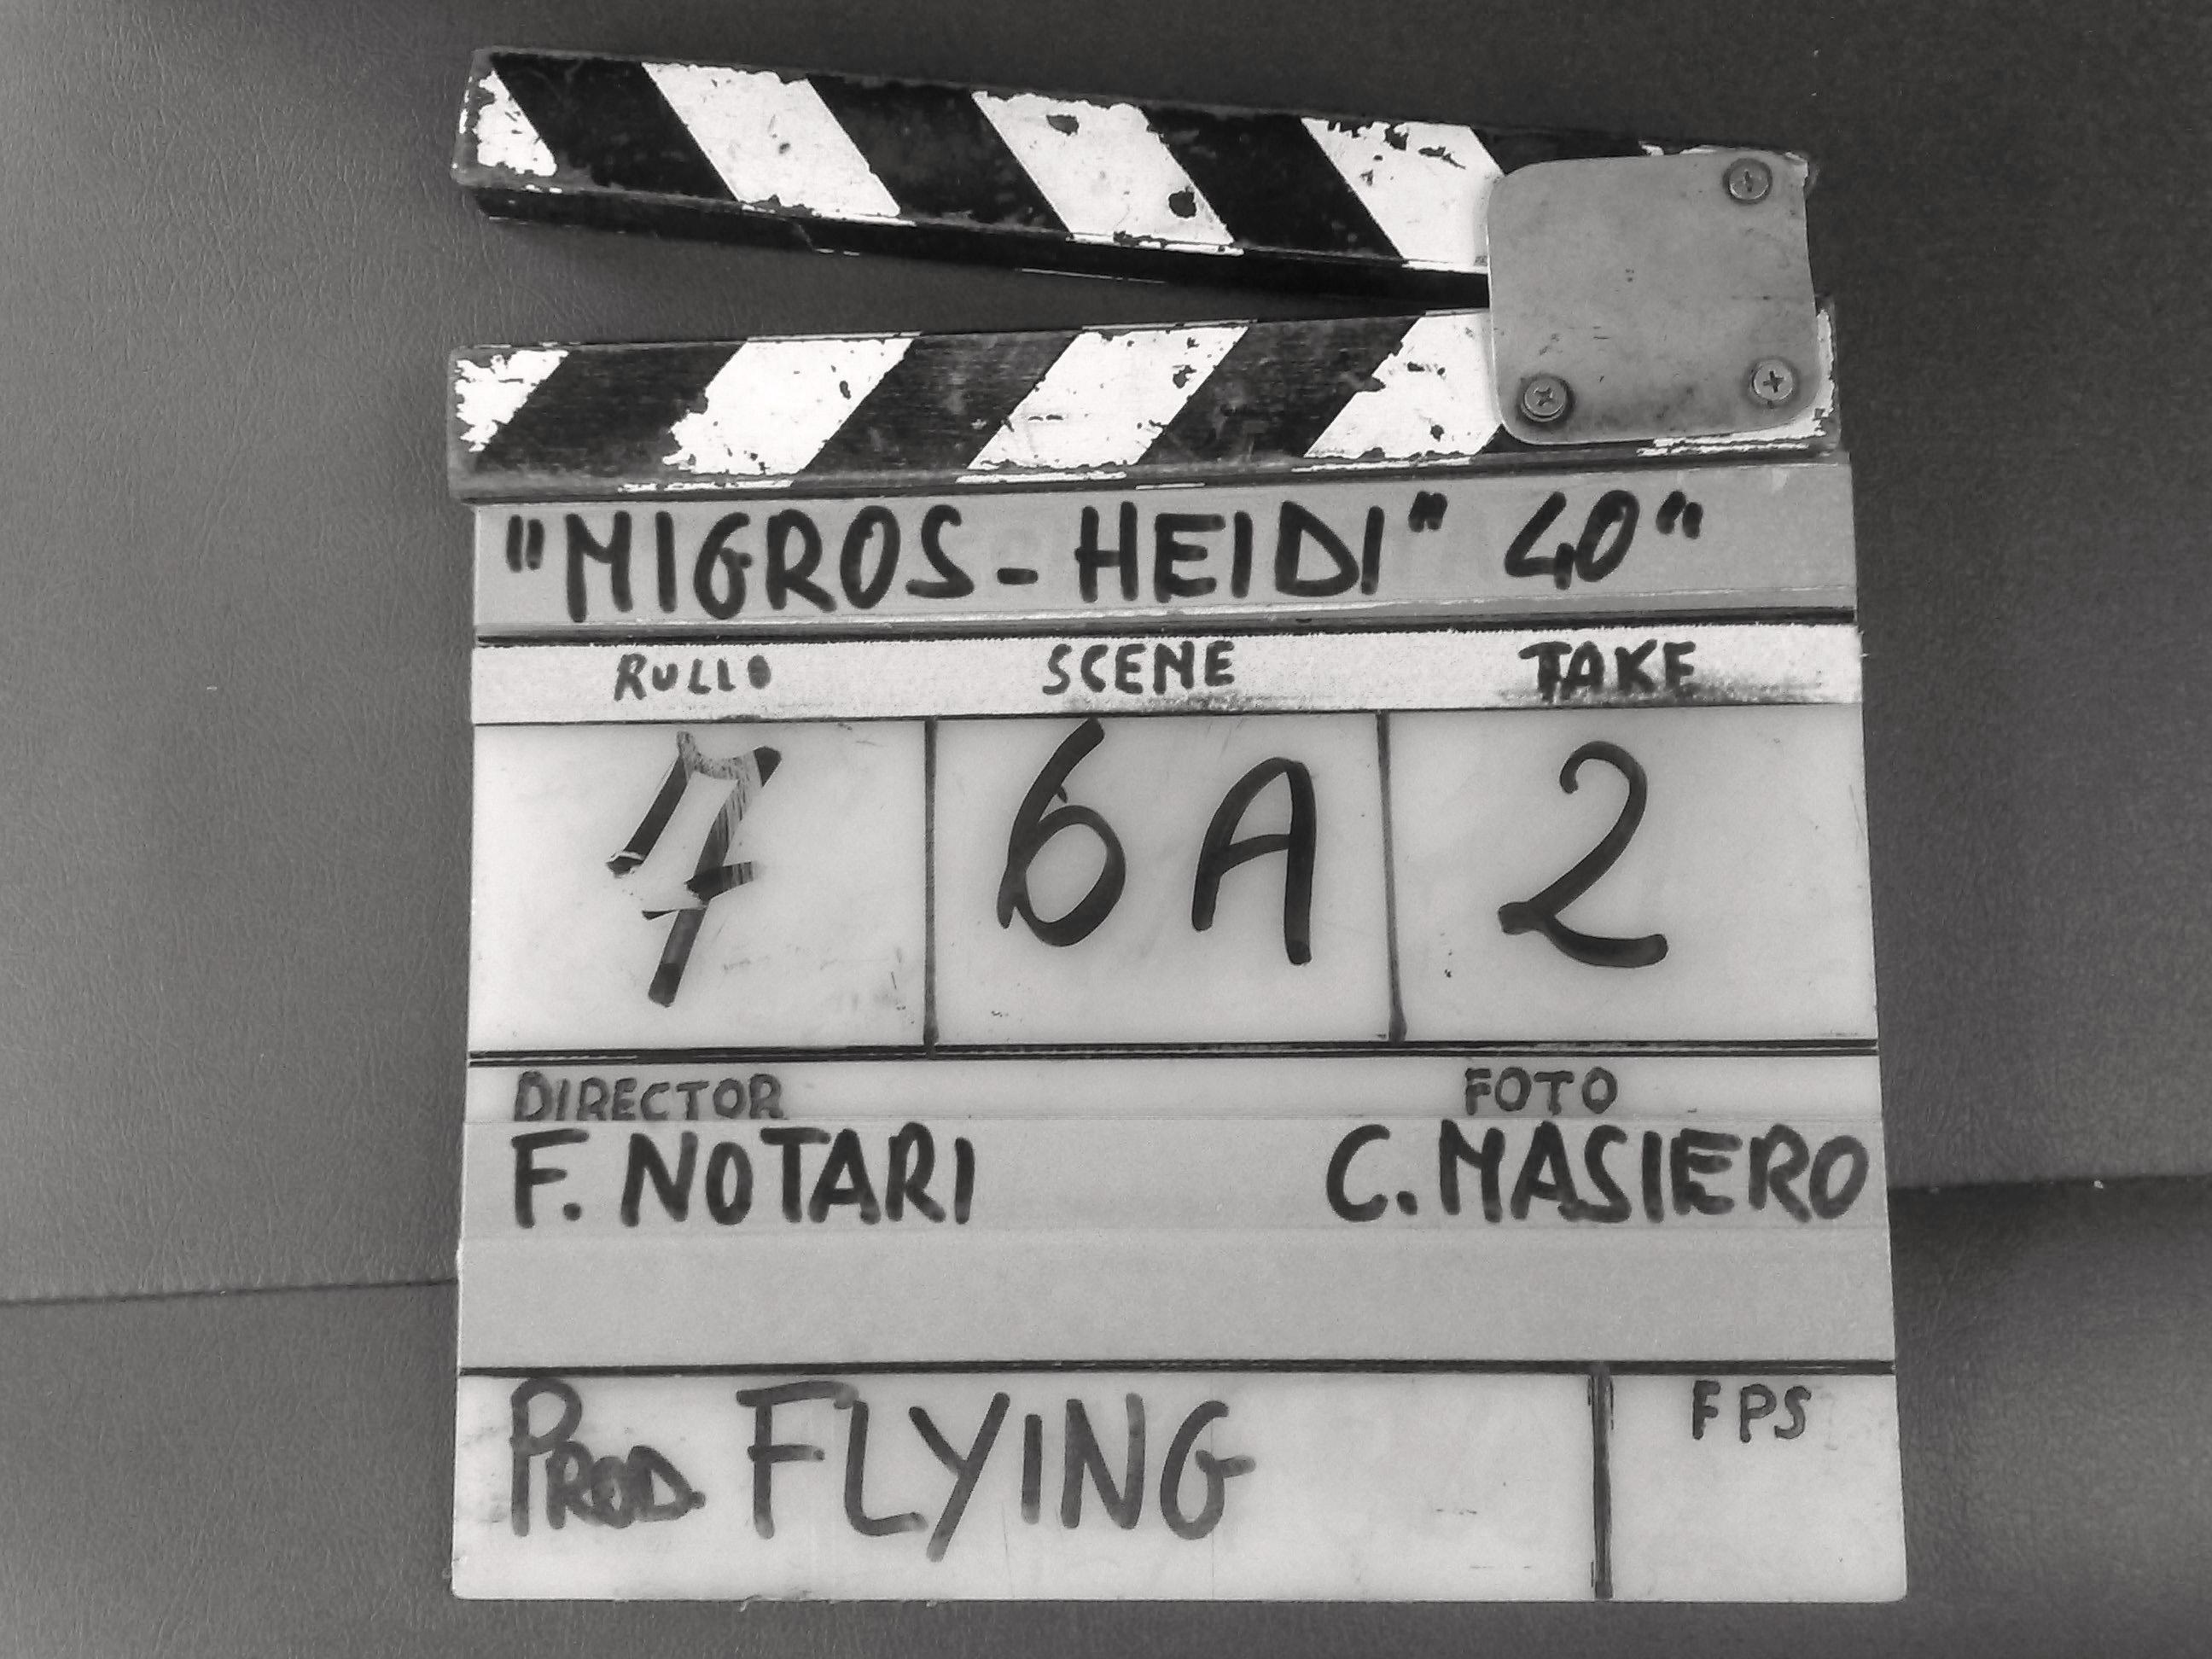 Migros Heidi